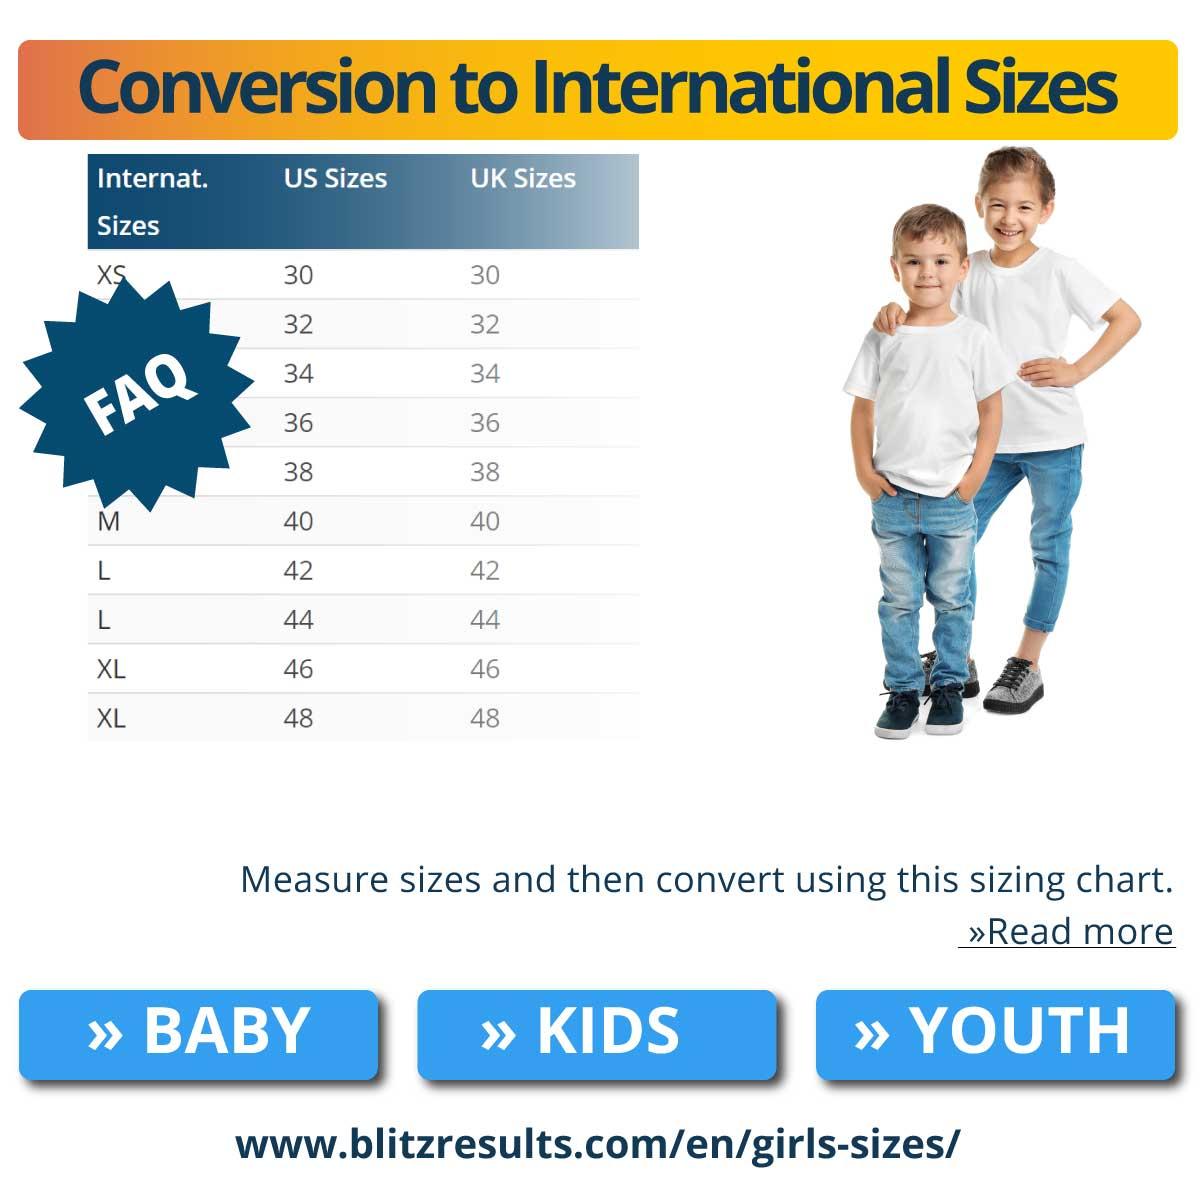 Conversion to International Sizes